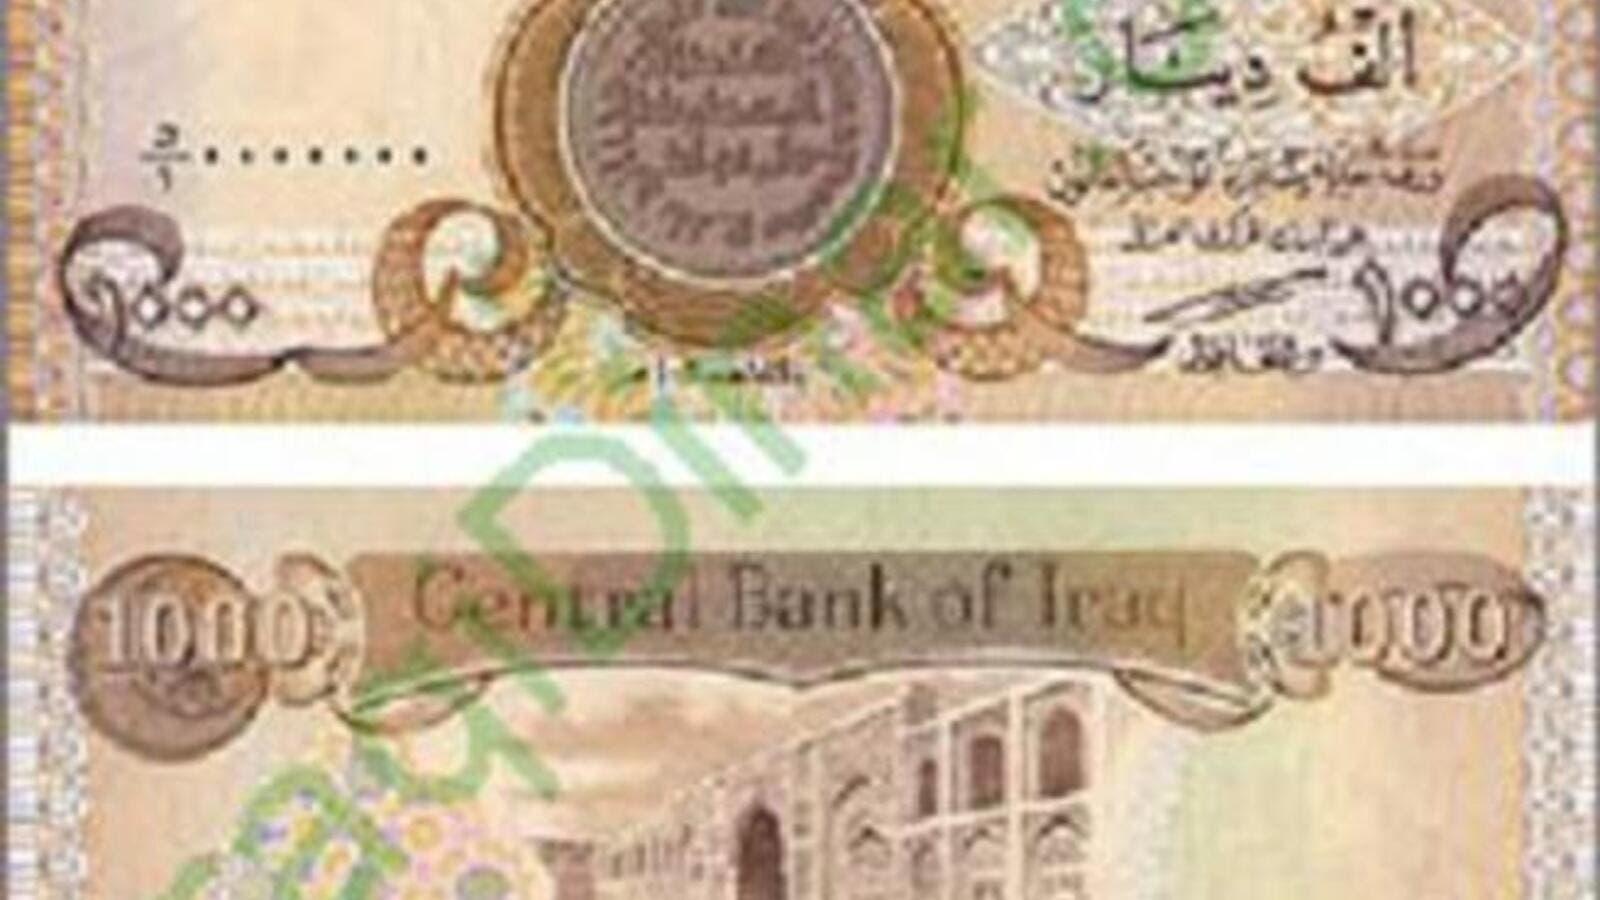 Iraqi Dinar News Updated Daily - Thereset